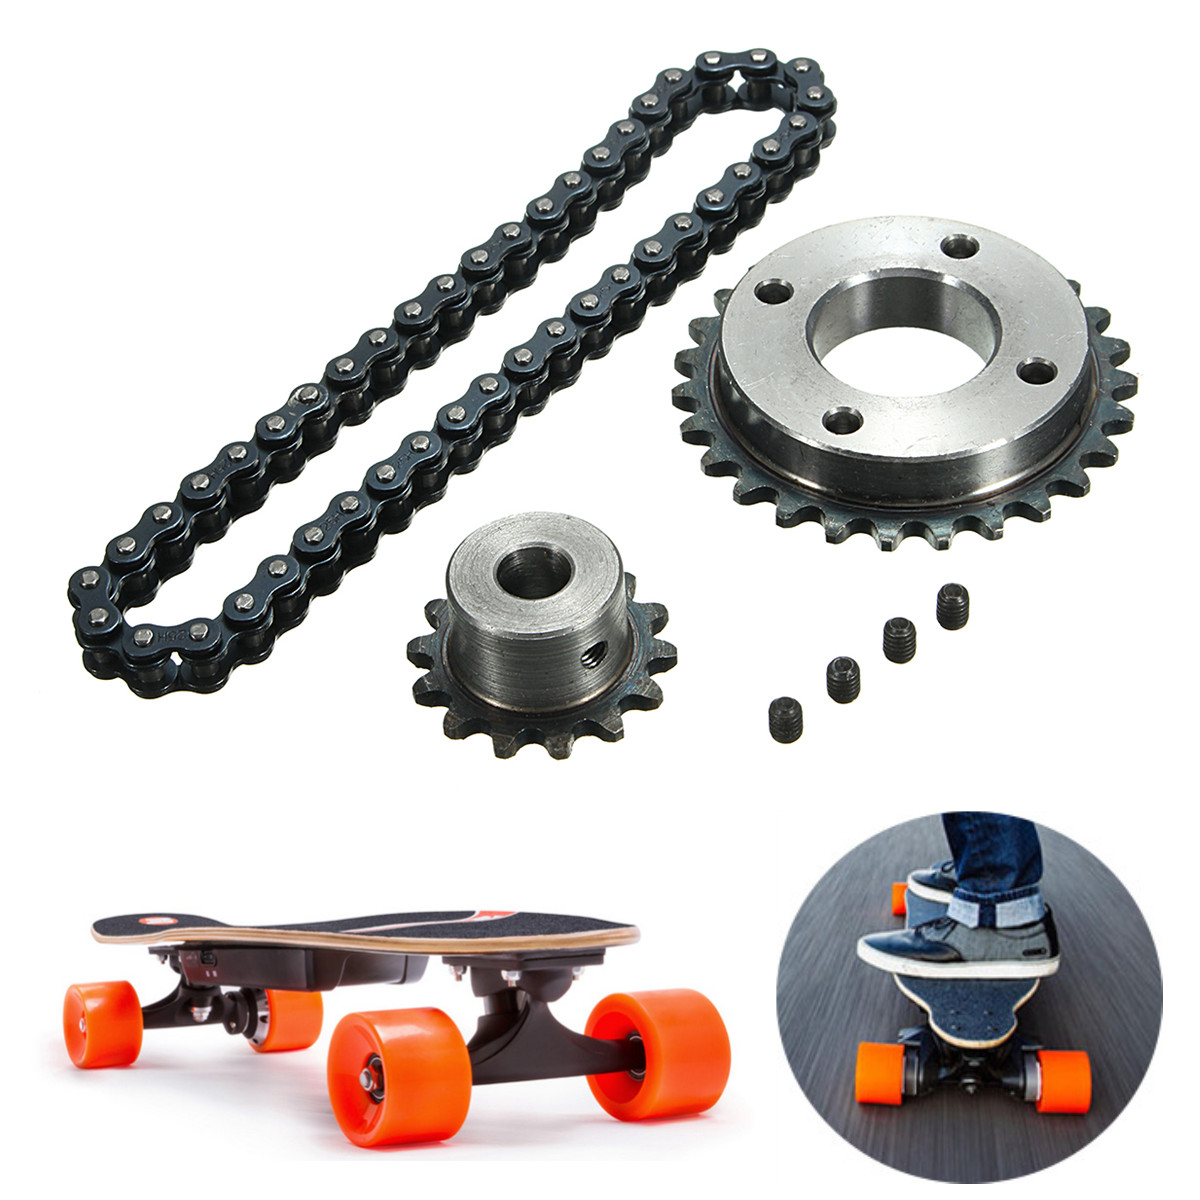 DIY Sprocket Chain Wheel for Electric Longboard 8044 Skateboard Repalcement Part Skateboard Accessories-in Skate Board from Sports & Entertainment